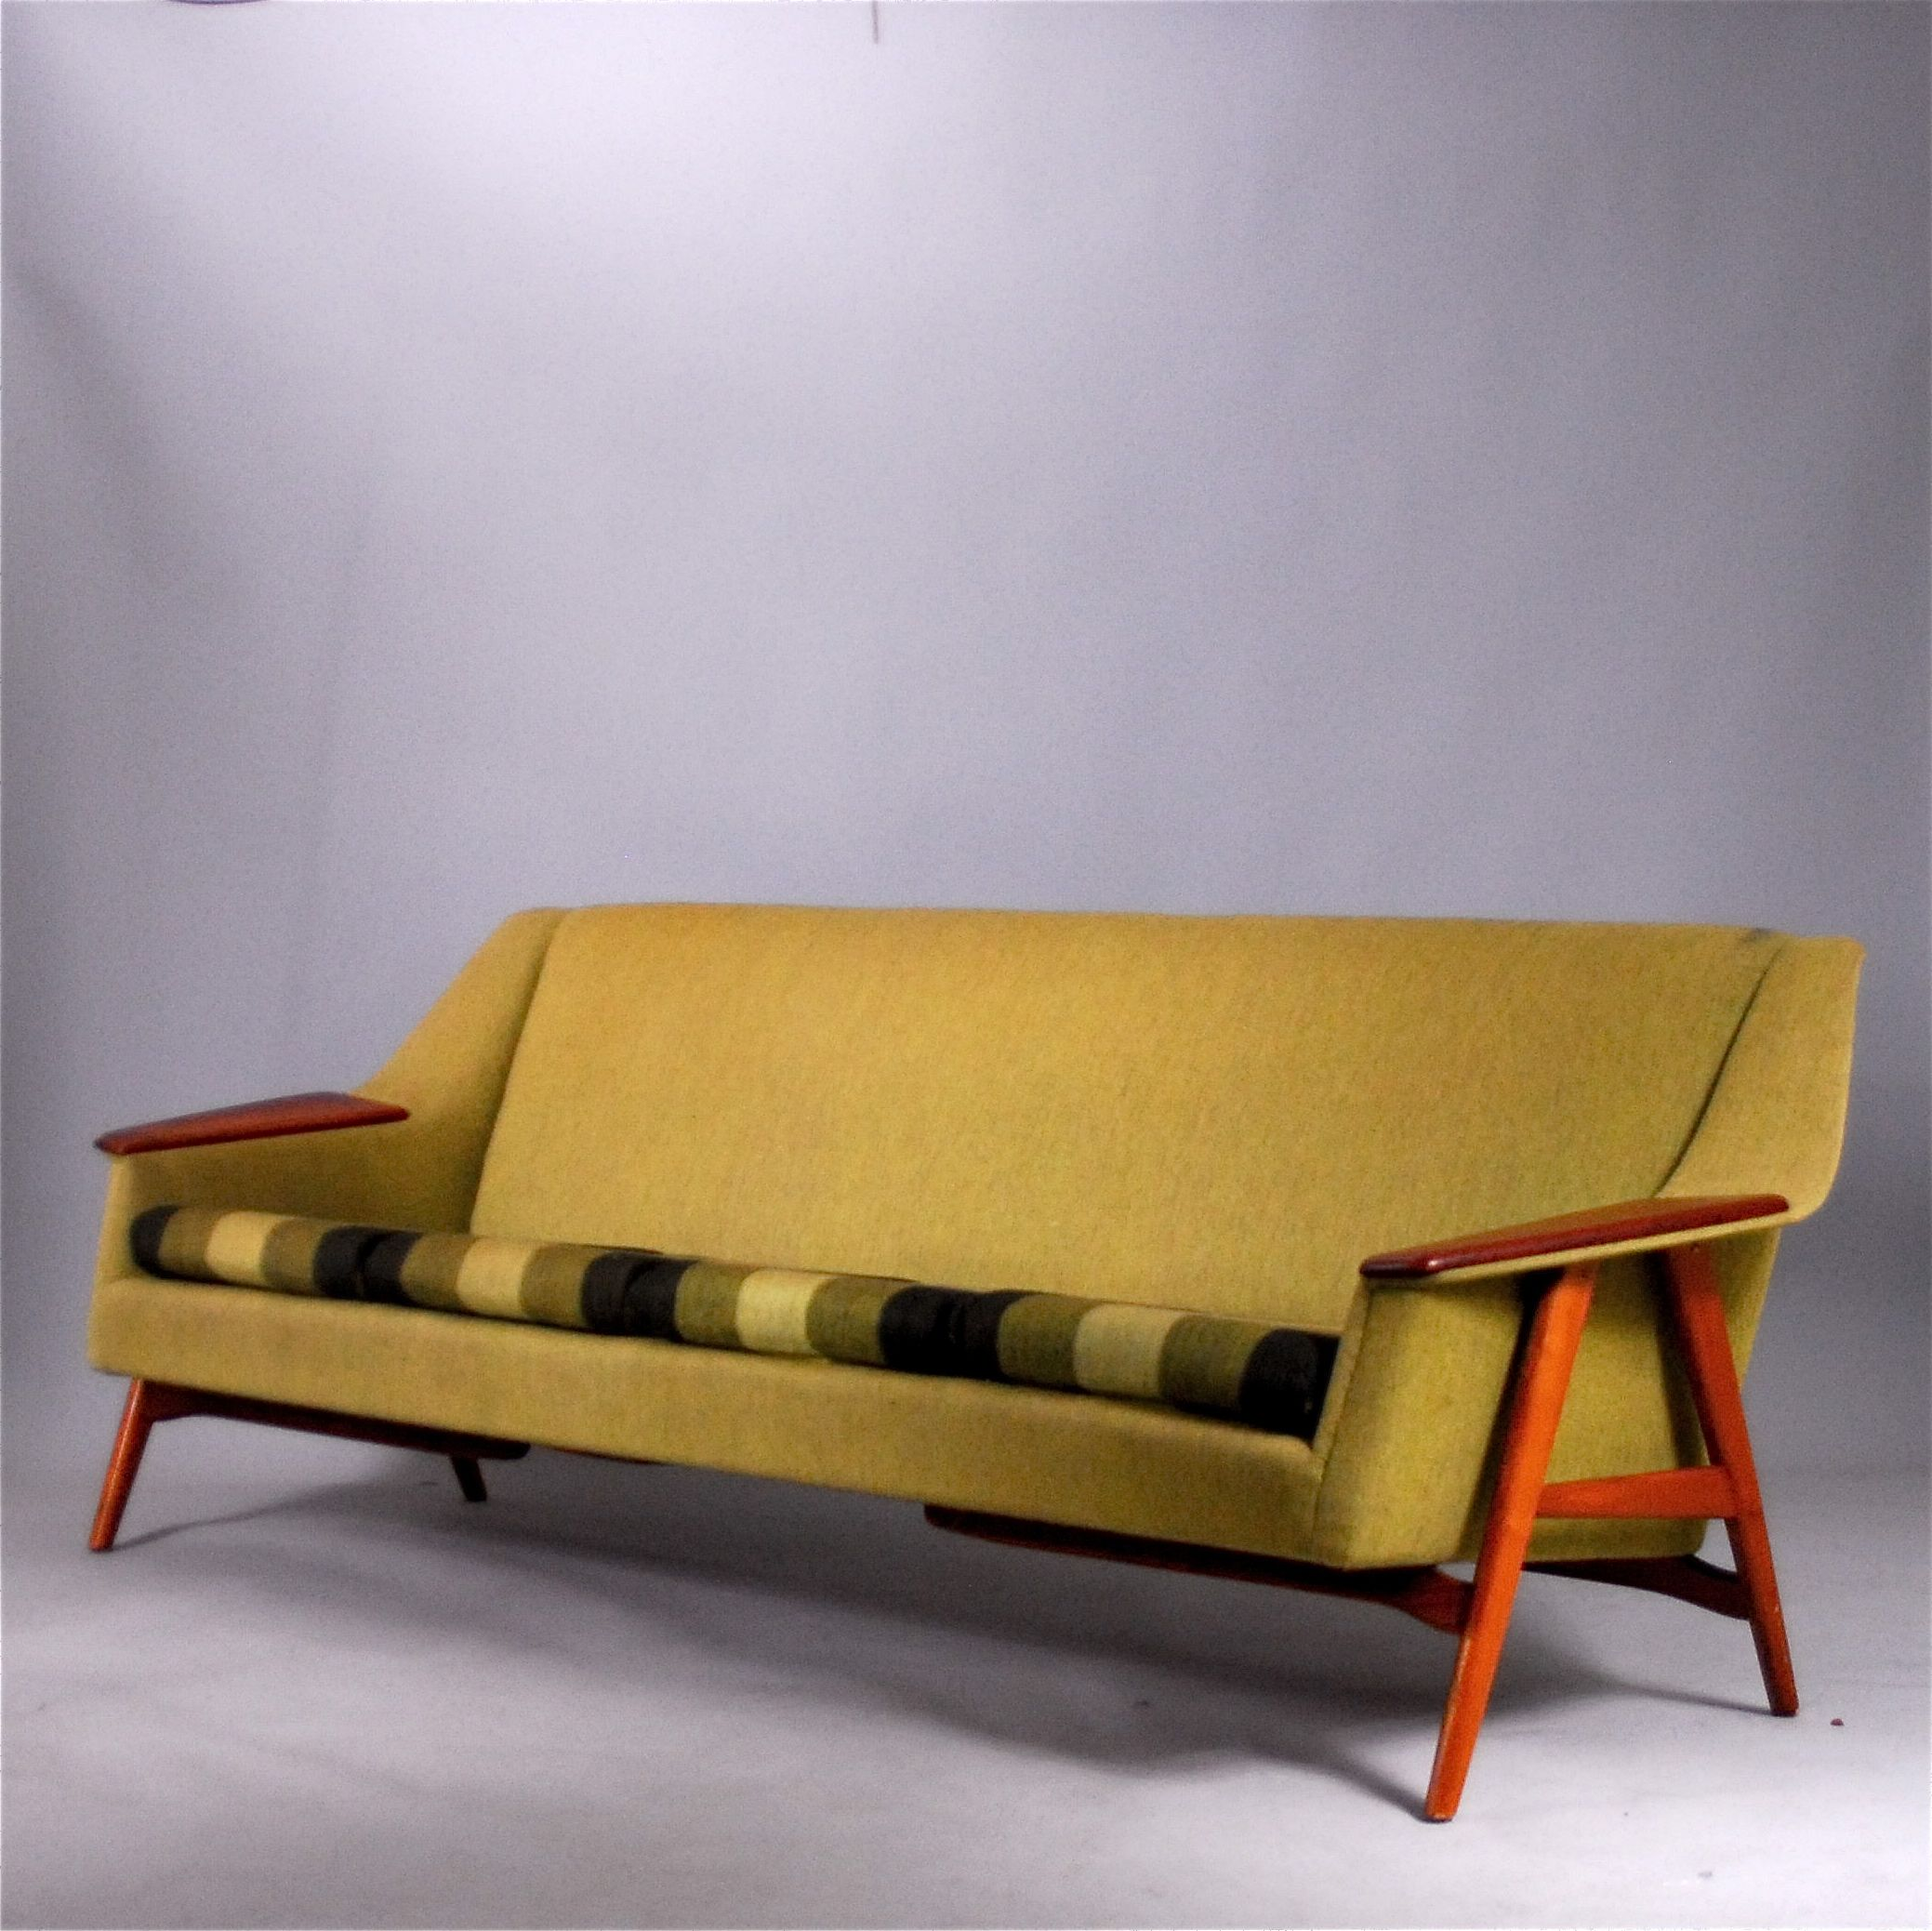 Wilhelm Knoll Teak Sectional Sleeper Sofa for Knoll Germany